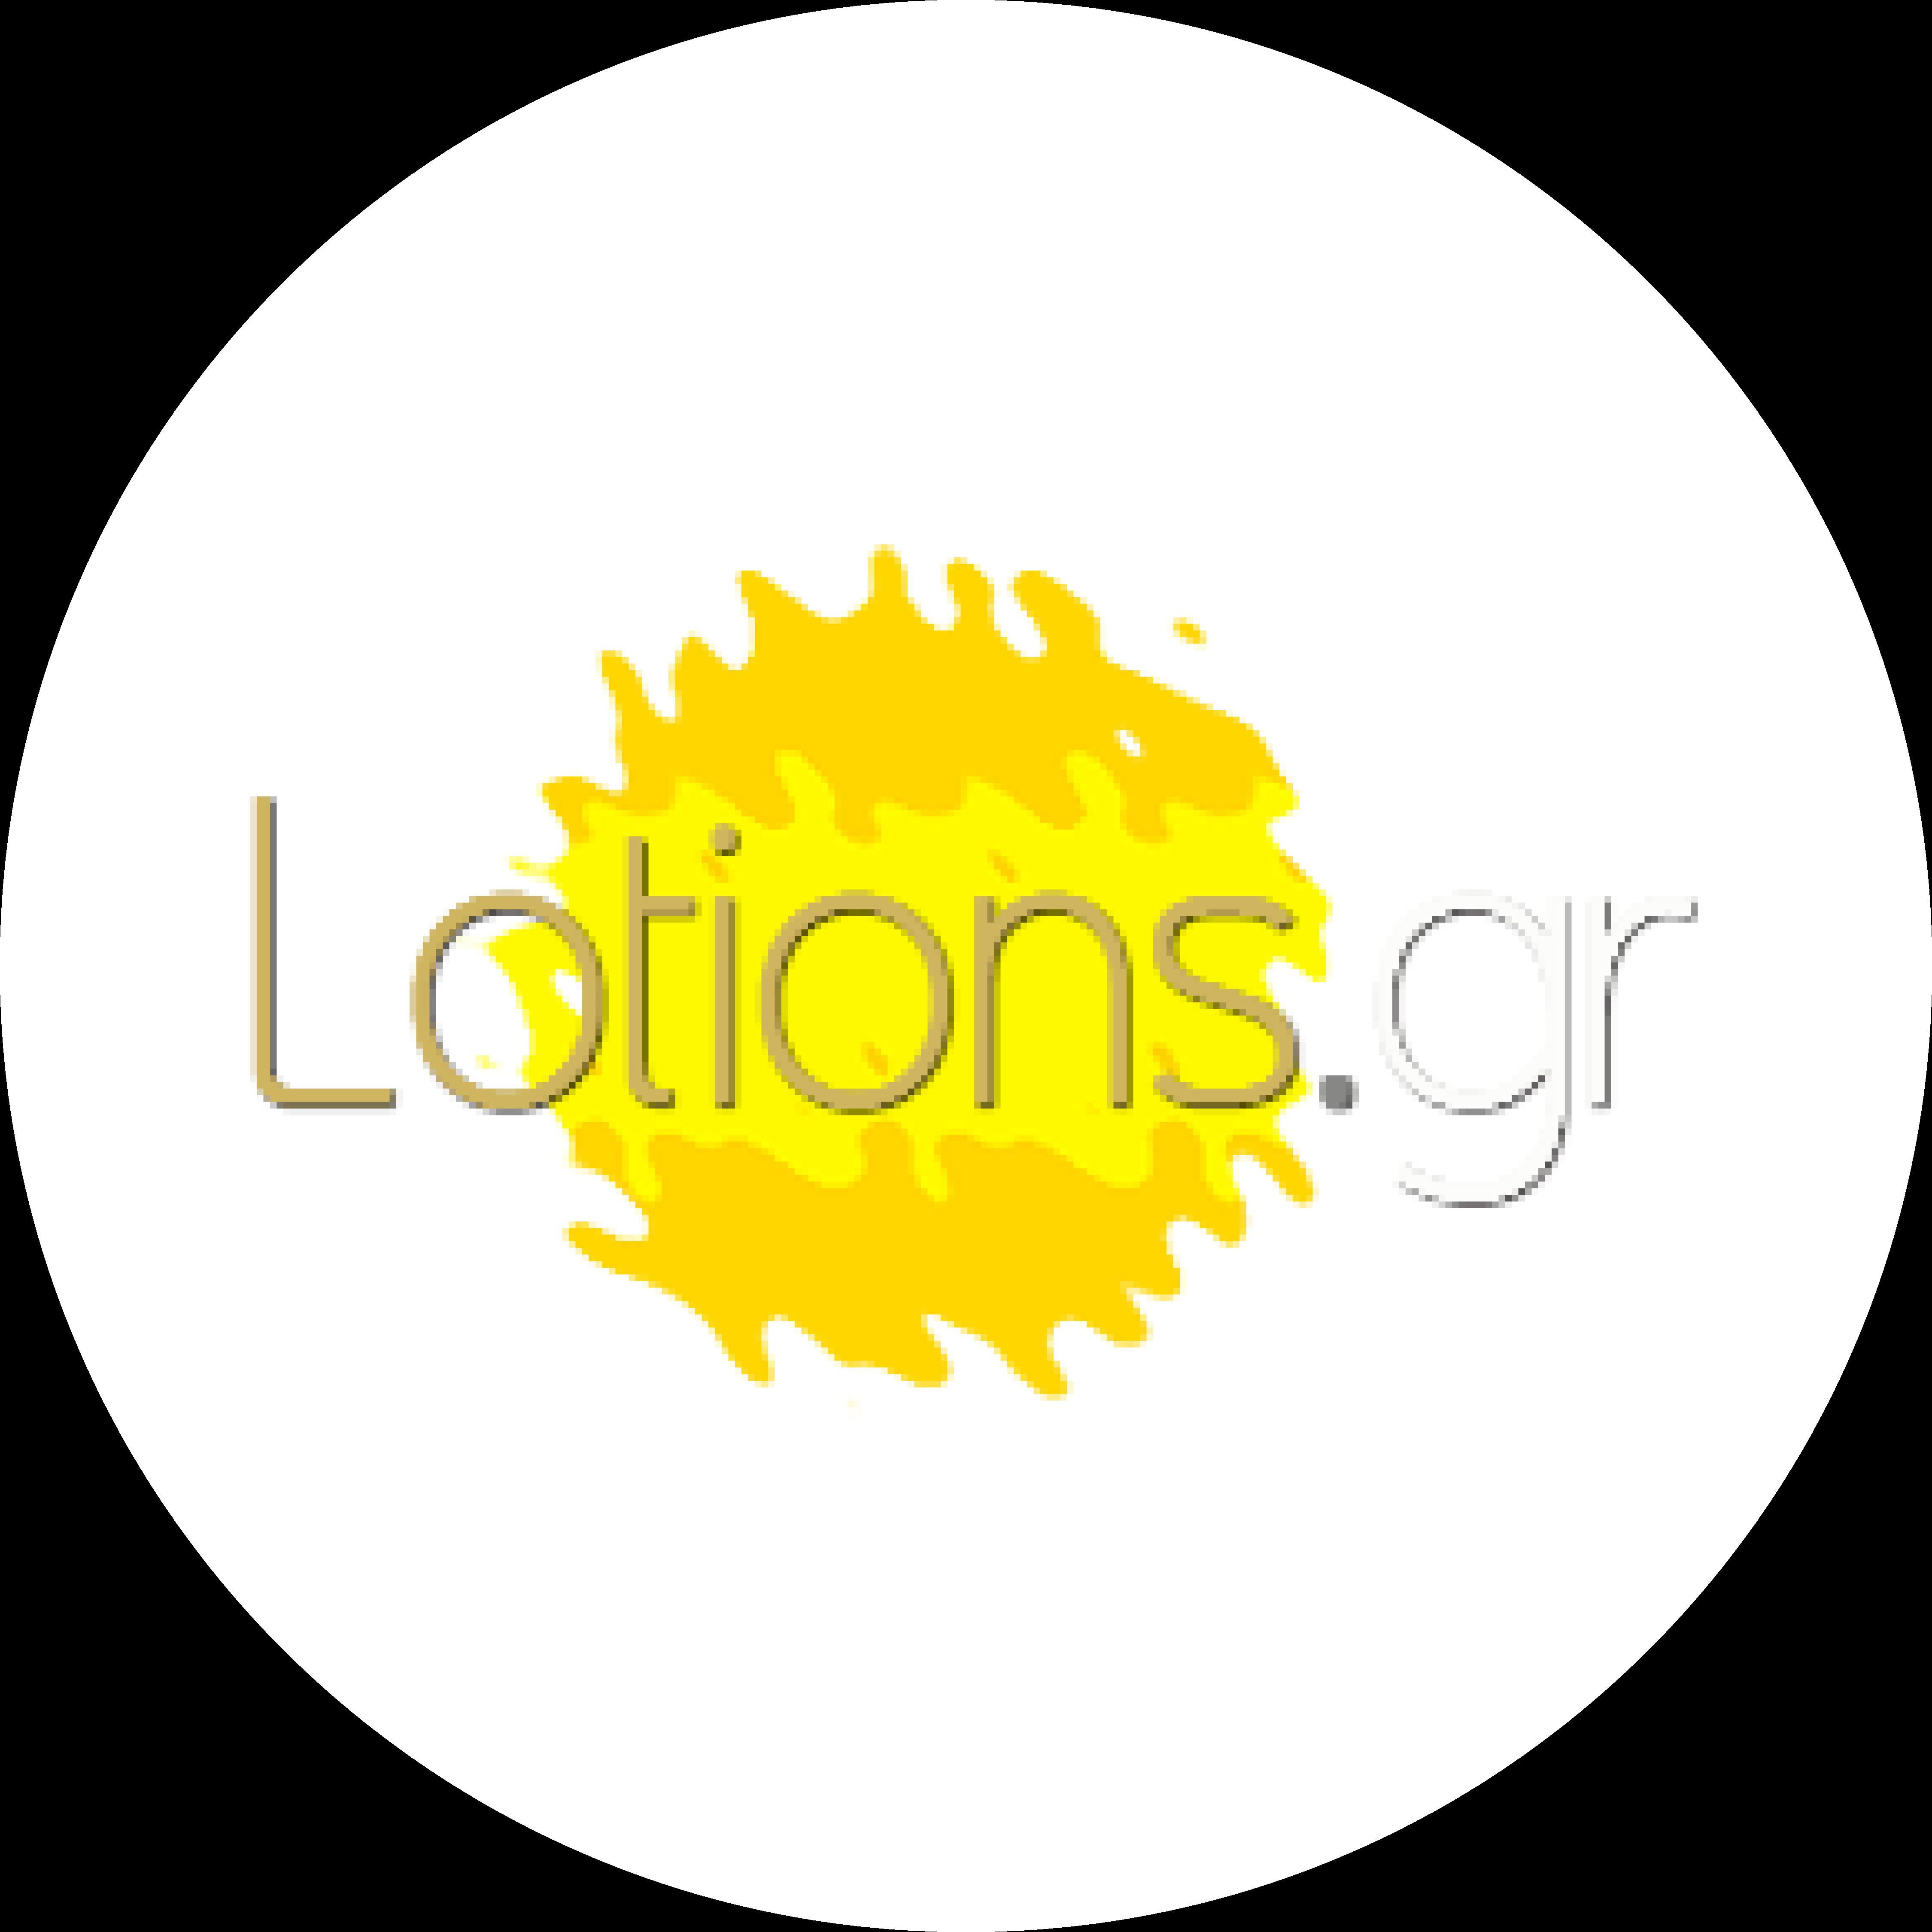 T_Lotionsgr